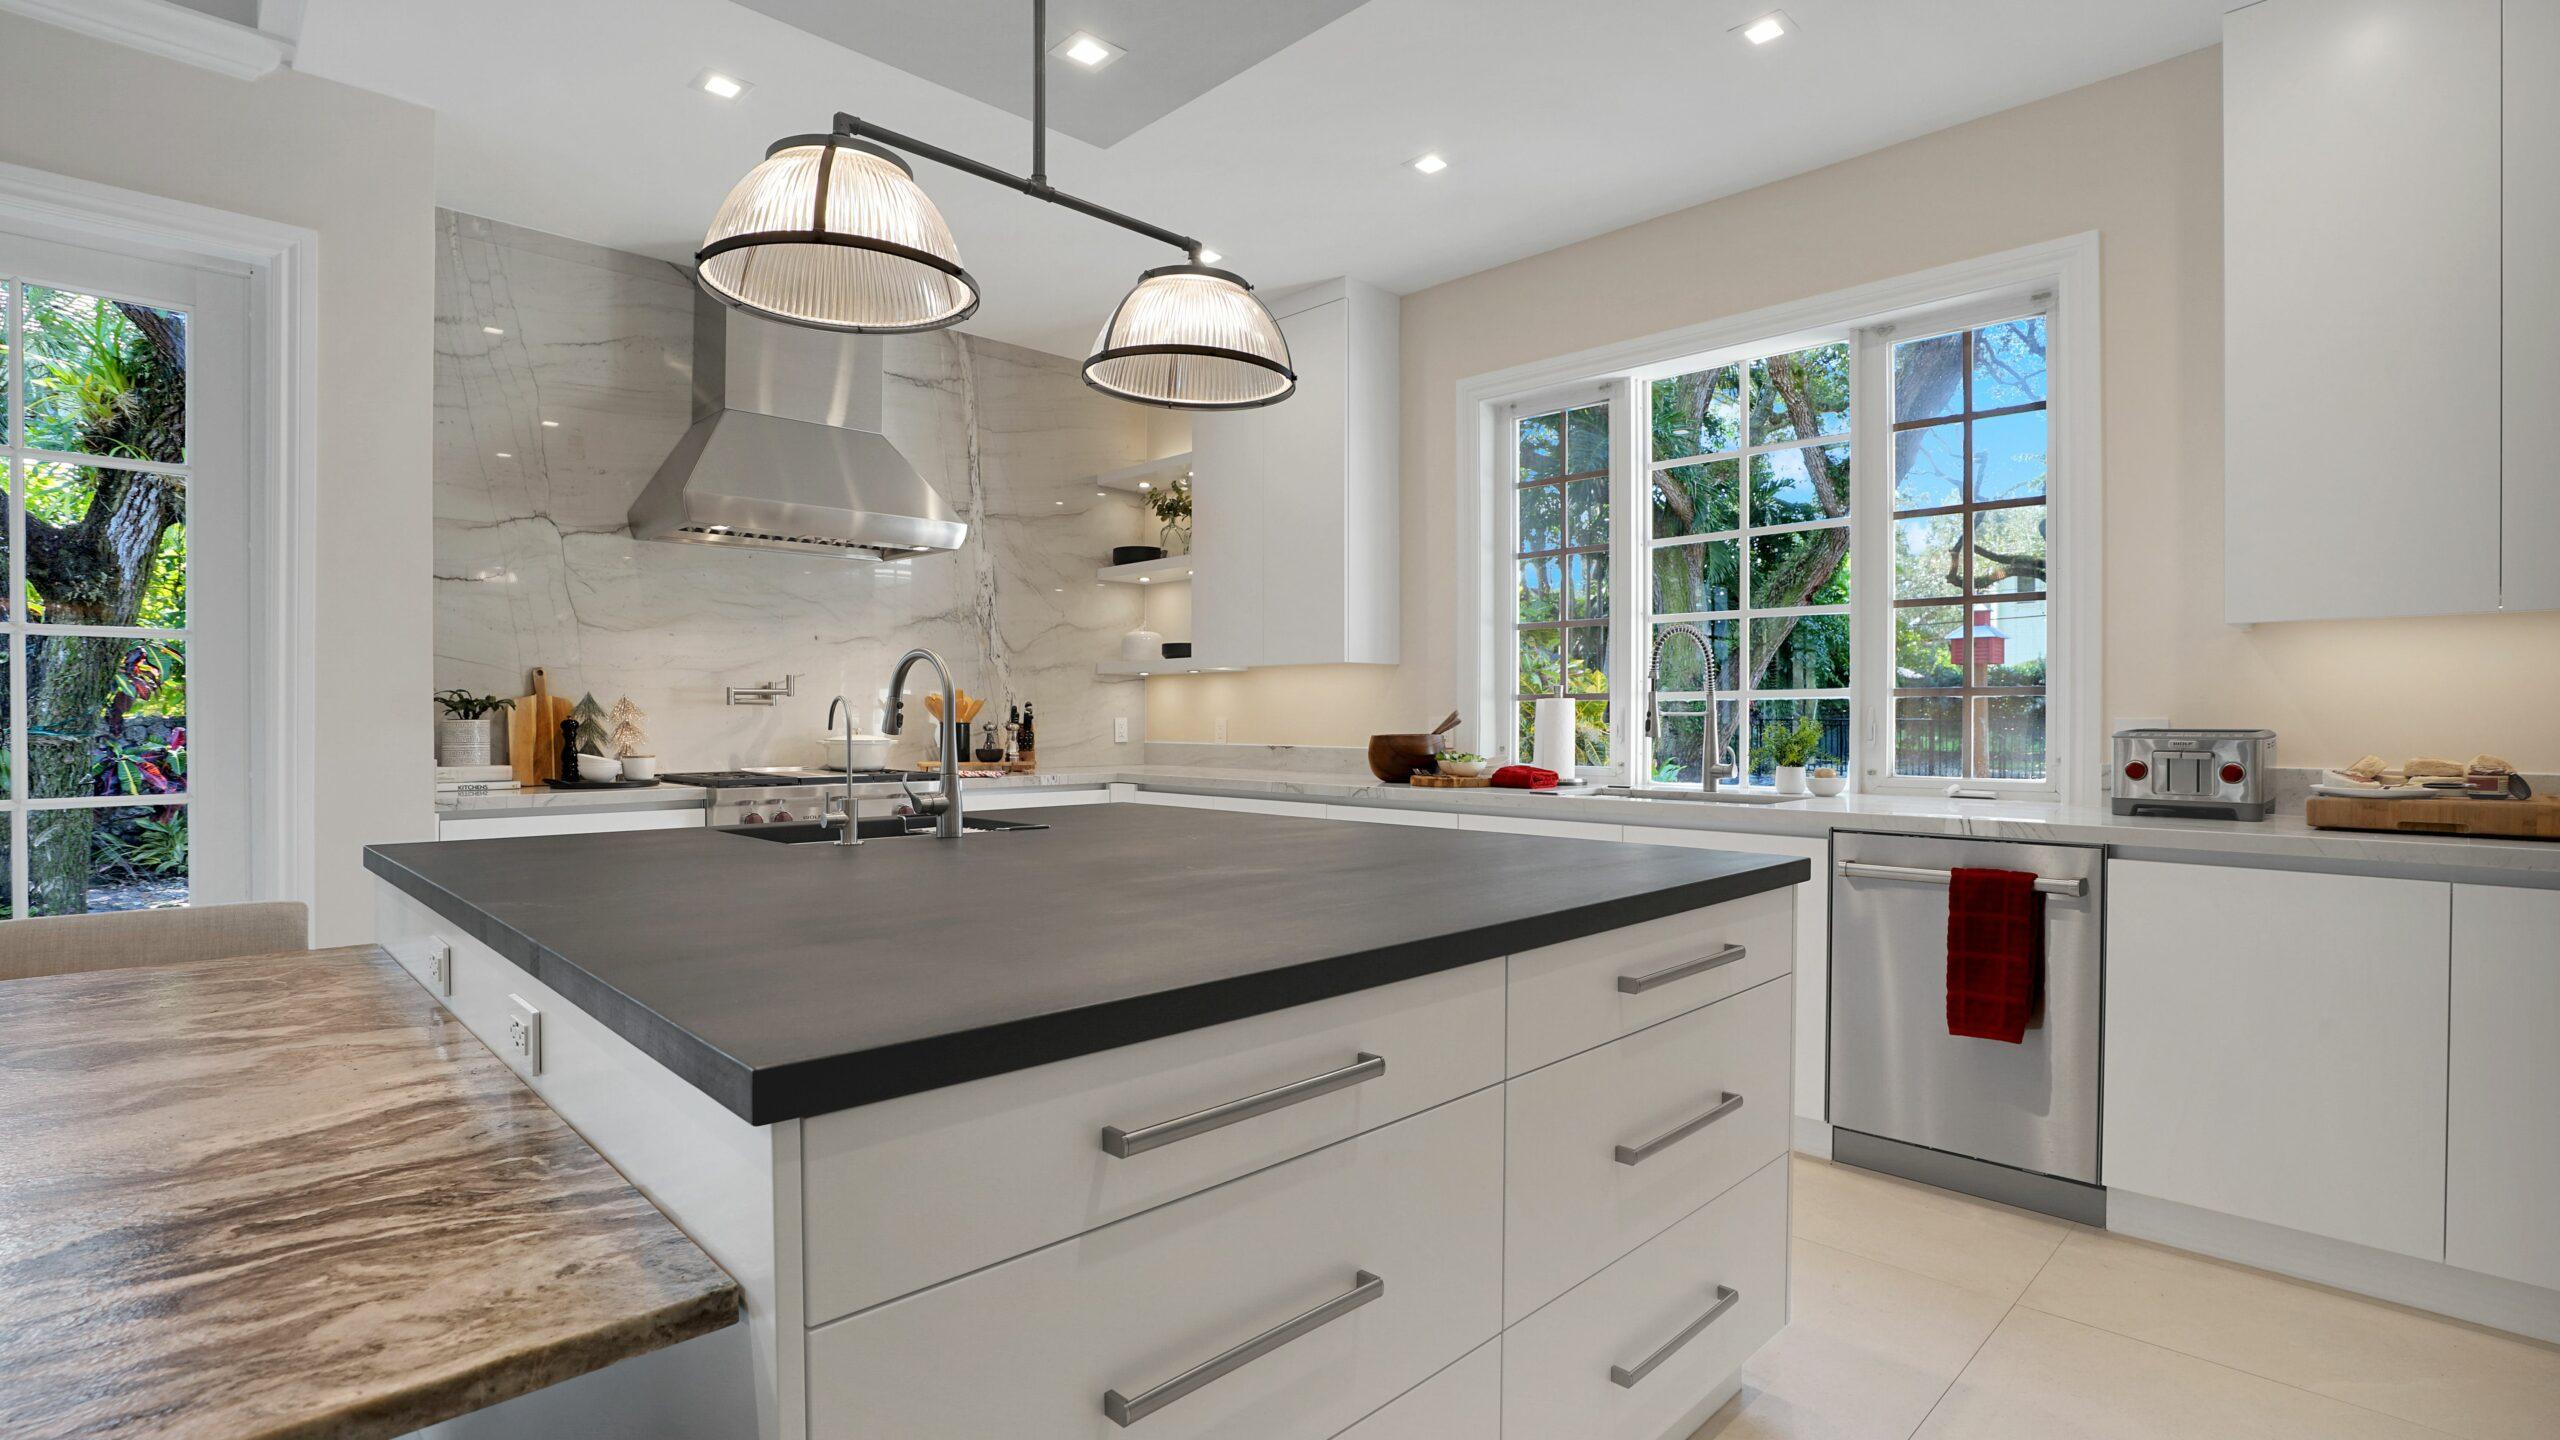 Kitchen Redesign in Miami Beach, Miami Lakes, South Miami, Brickell, Coconut Grove, and Key Biscayne